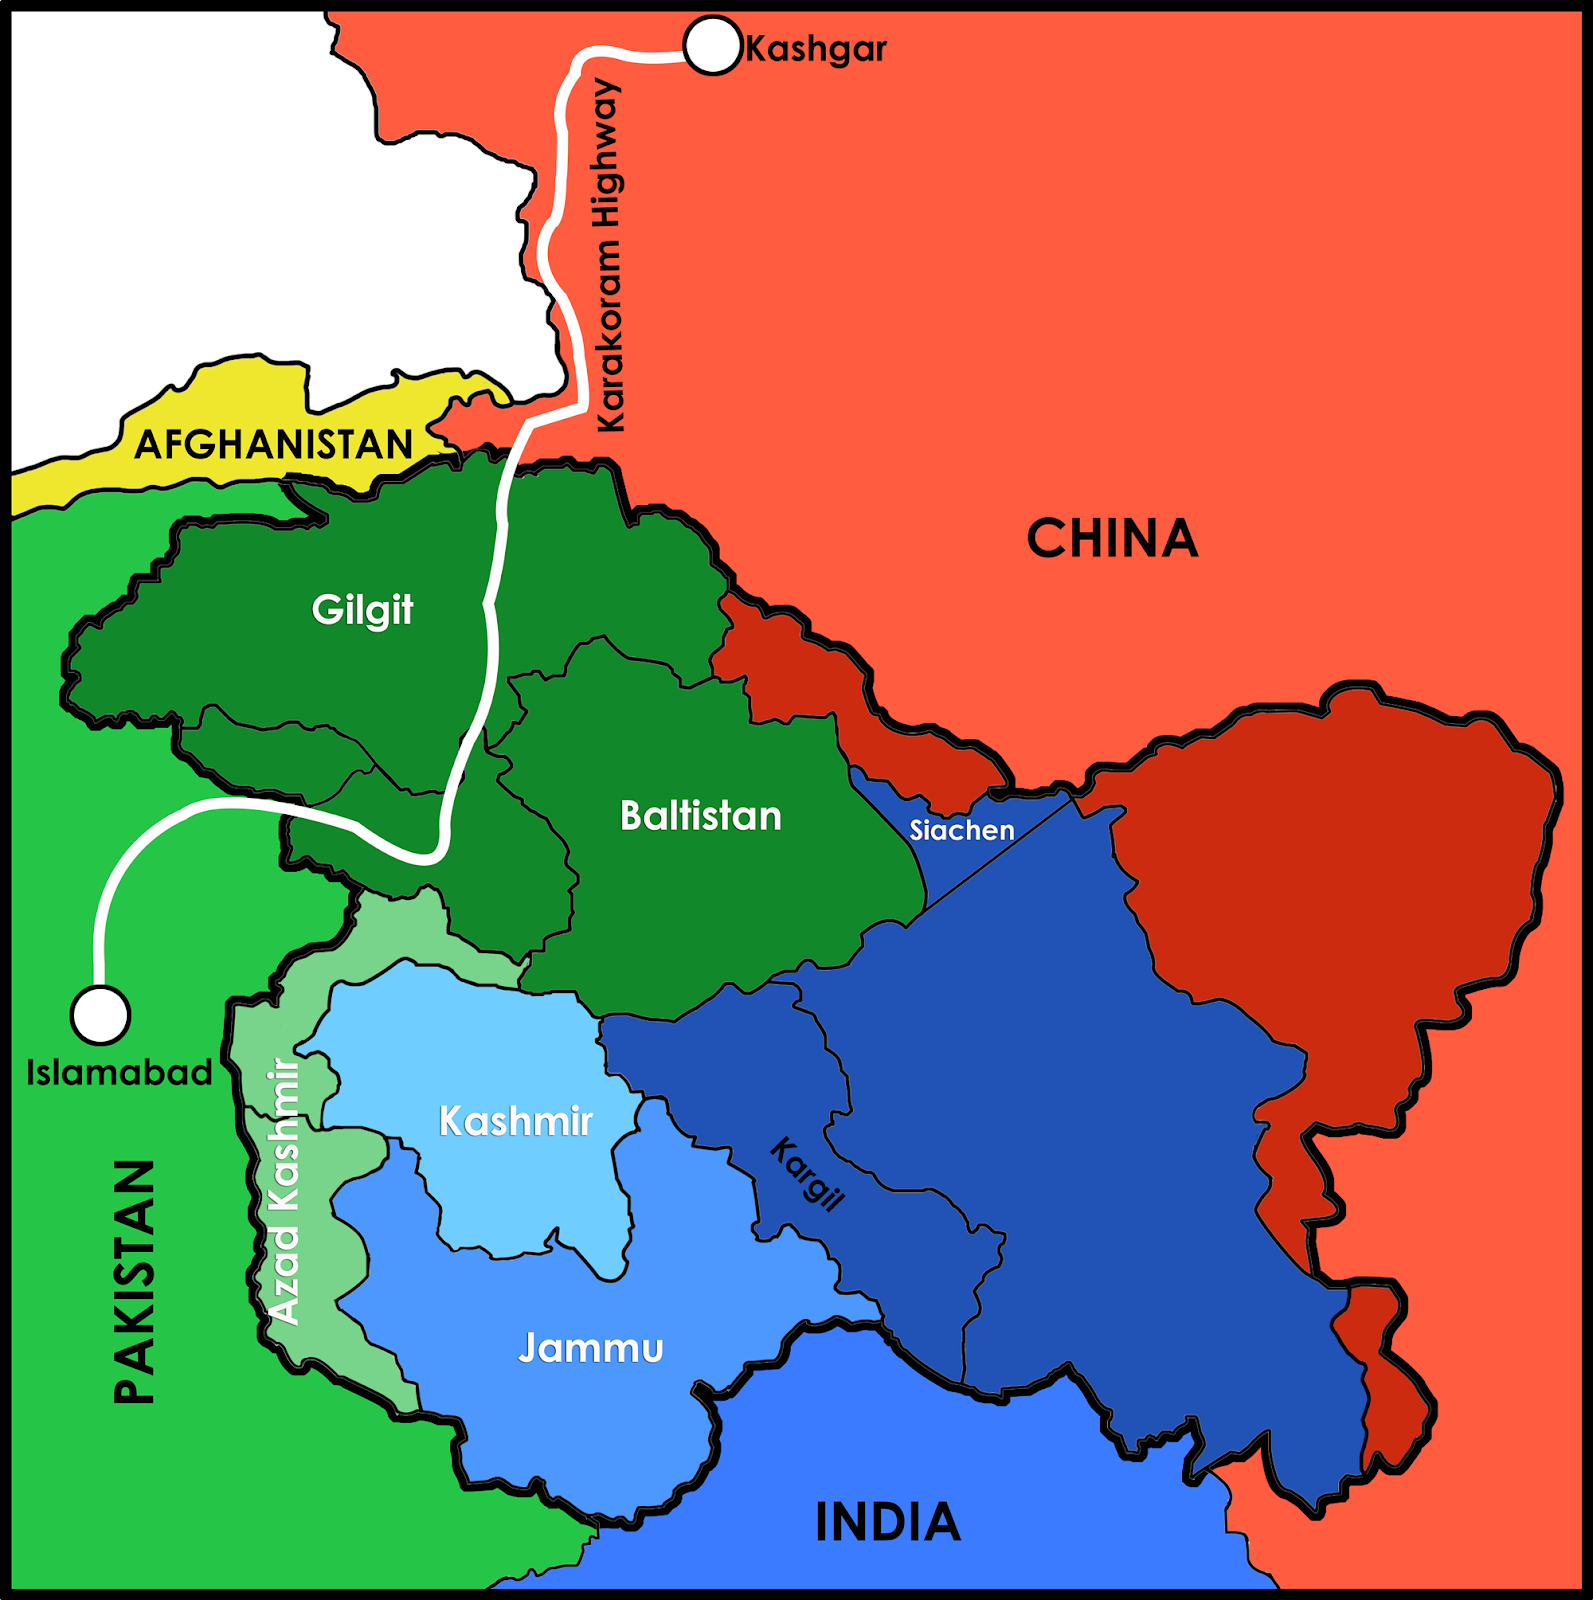 Map showing Karakoram Highway from China to Pakistan